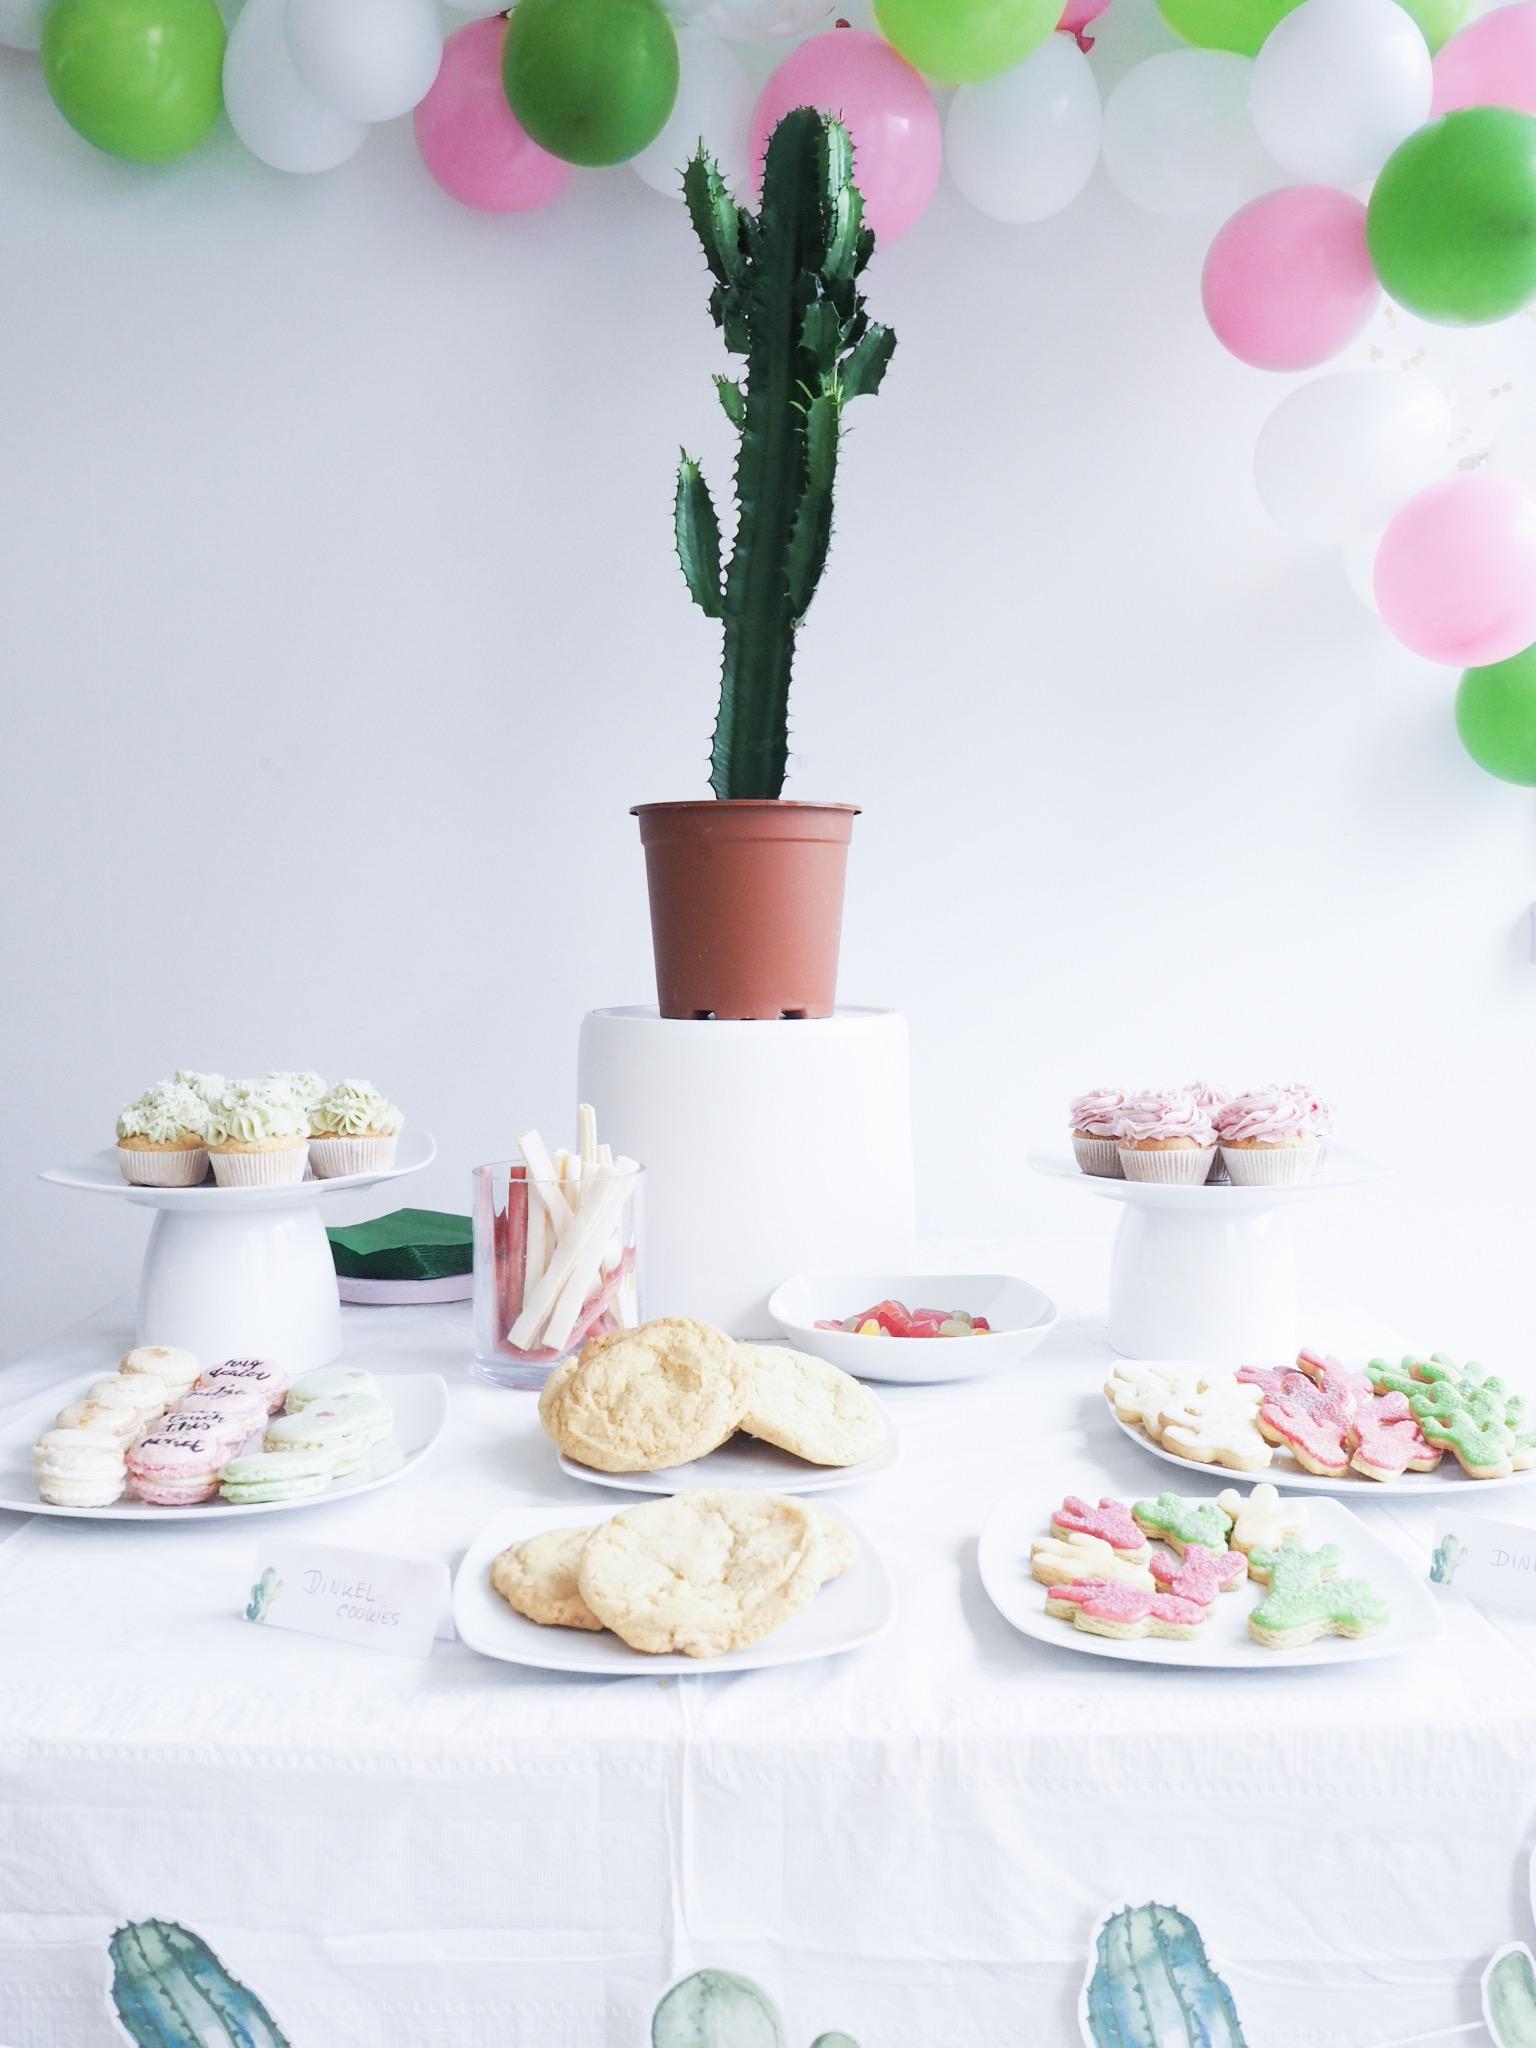 Dessertbuffet mit Cupcakes, Kaktus, Macarons, Kaktuskeksen und Cookies